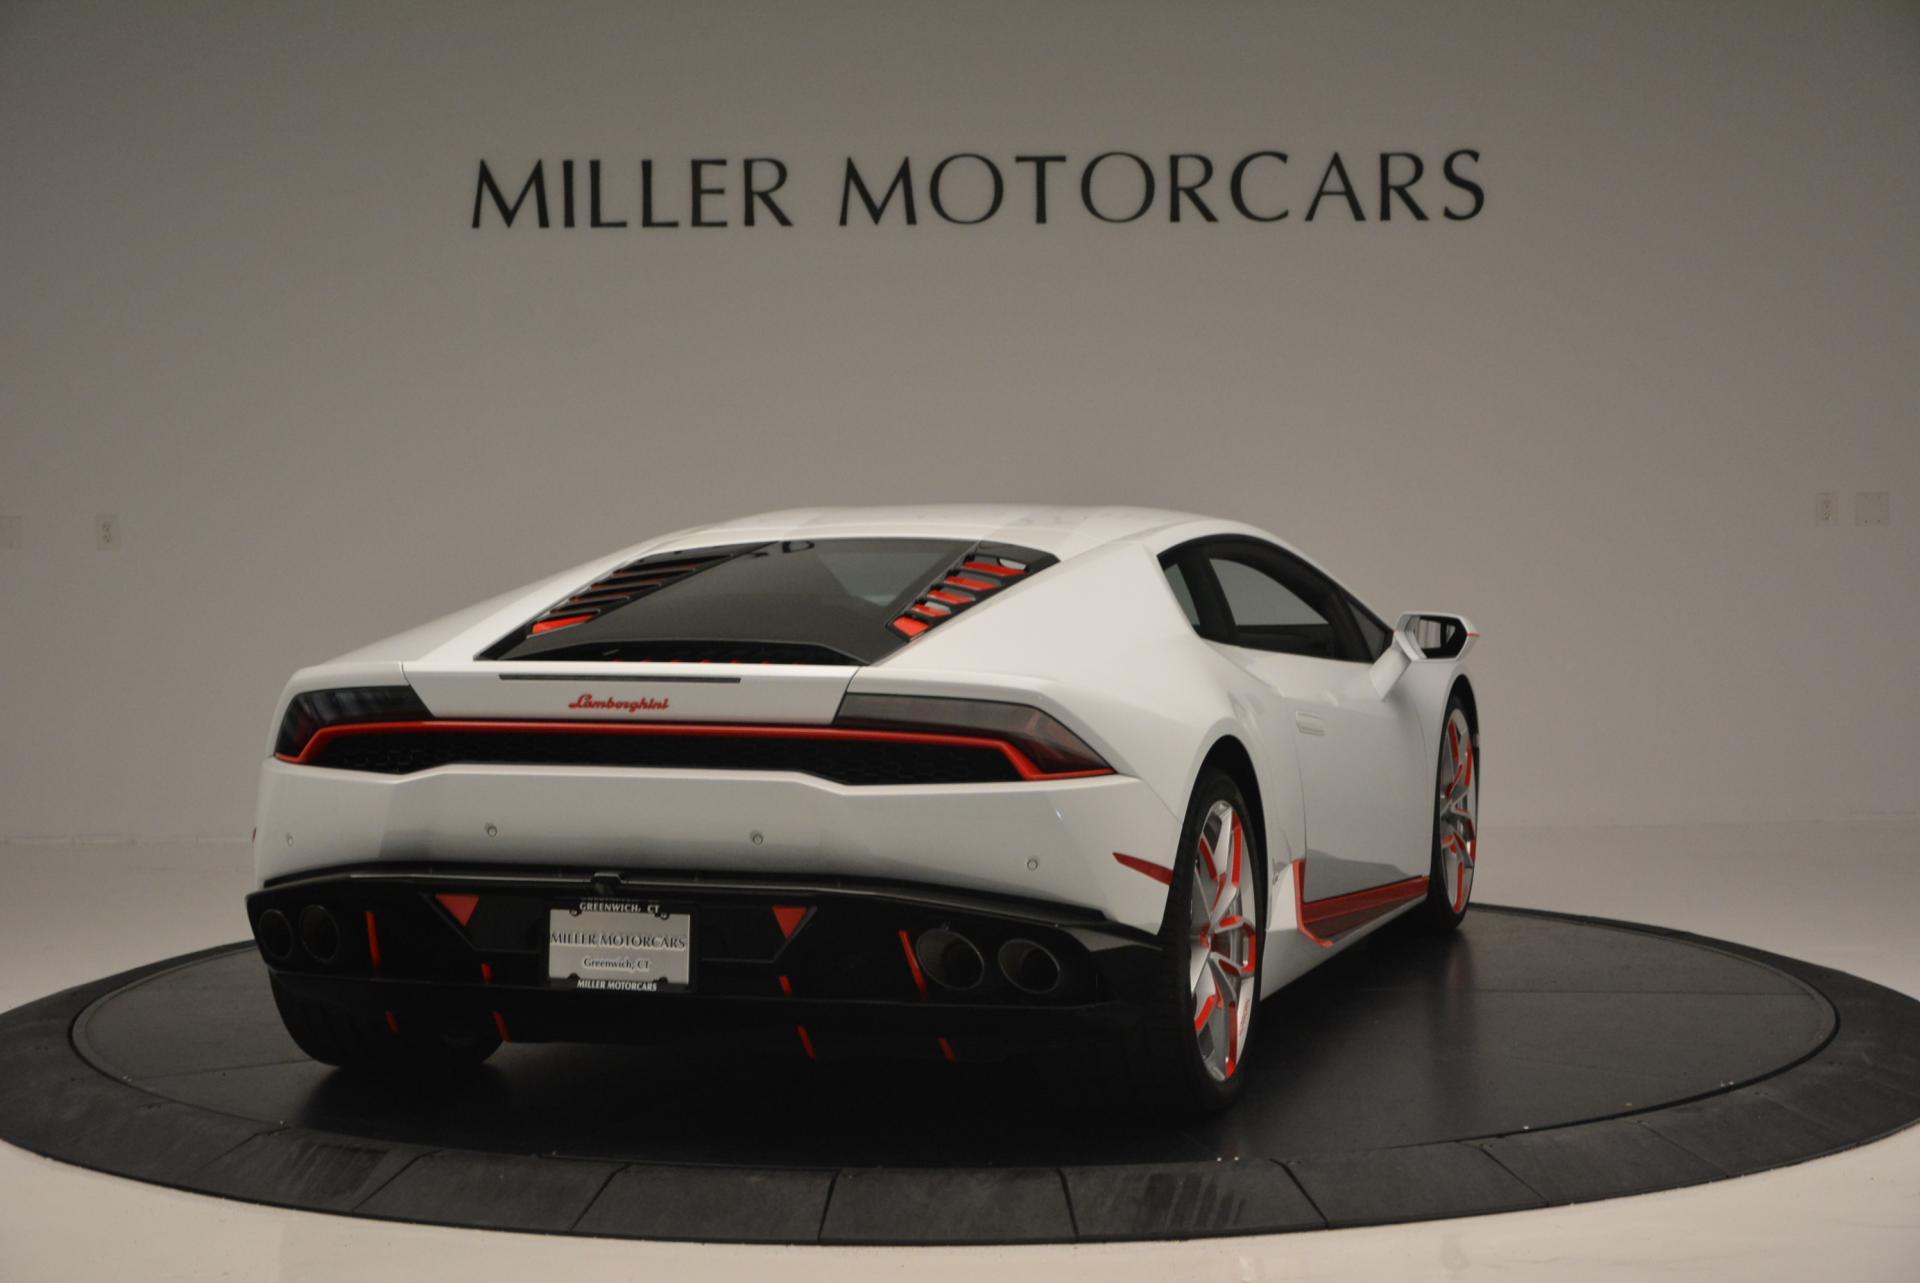 Used 2015 Lamborghini Huracan LP610-4 For Sale In Greenwich, CT. Alfa Romeo of Greenwich, F1707A 114_p9